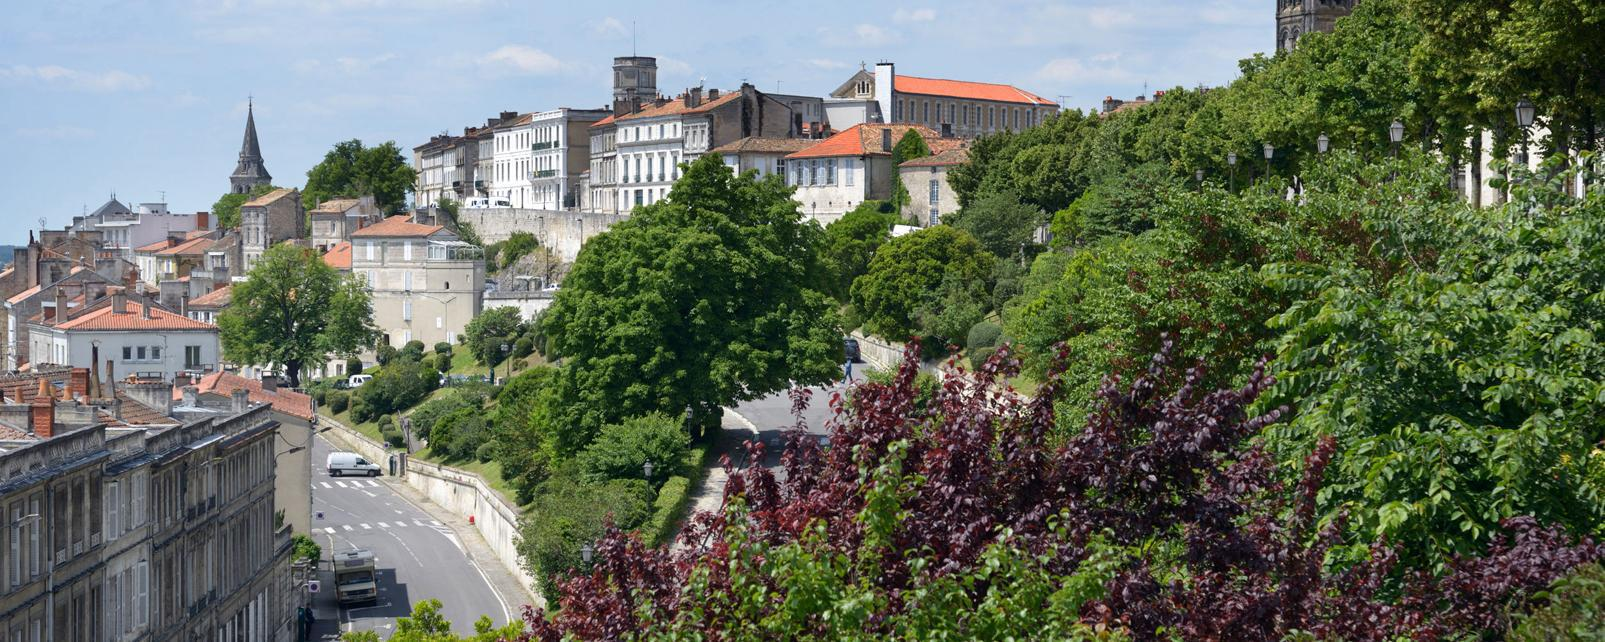 Europe; France; Poitou-Charentes; Angoulême;